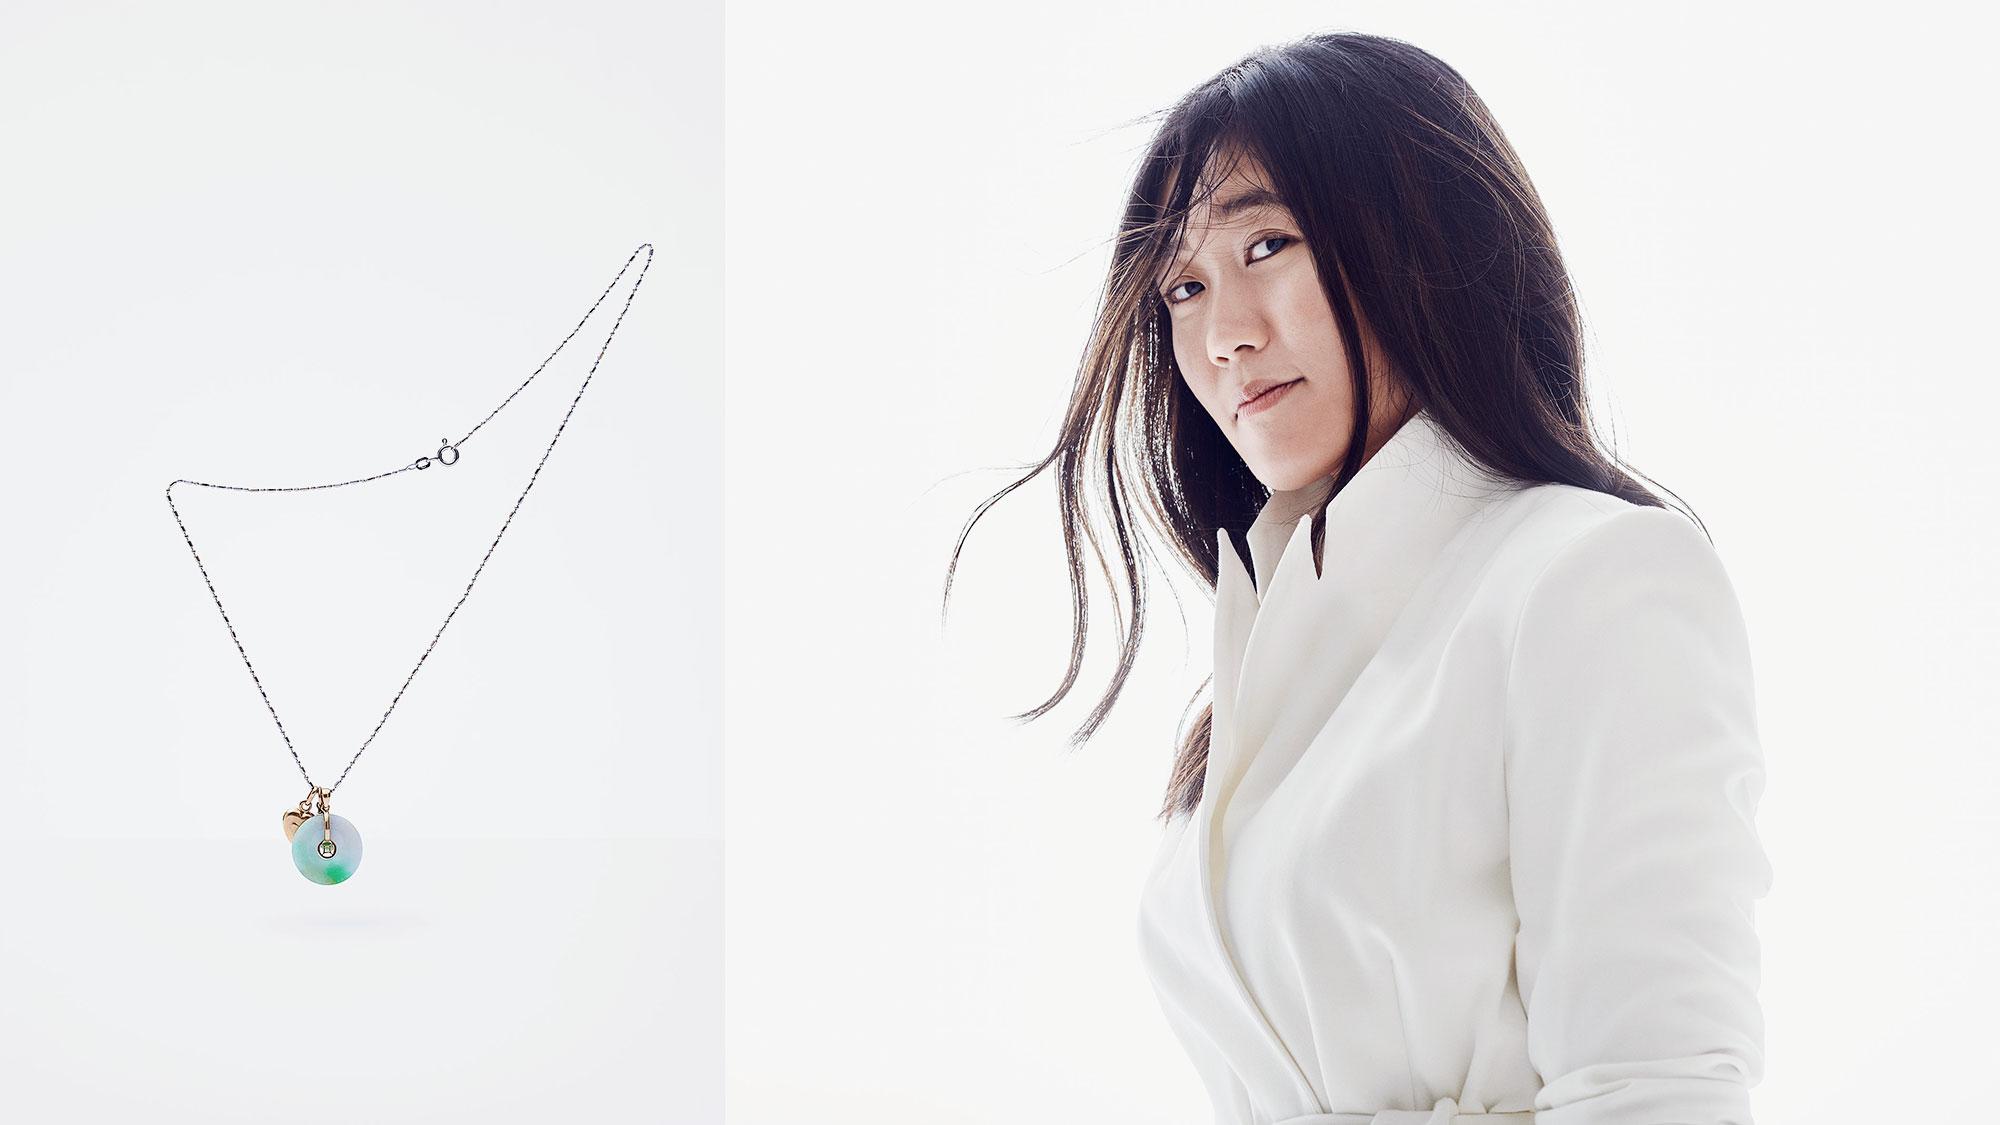 Michelle-Wong-women-in-data-sane-seven-creative-portrait-2000-px-wide